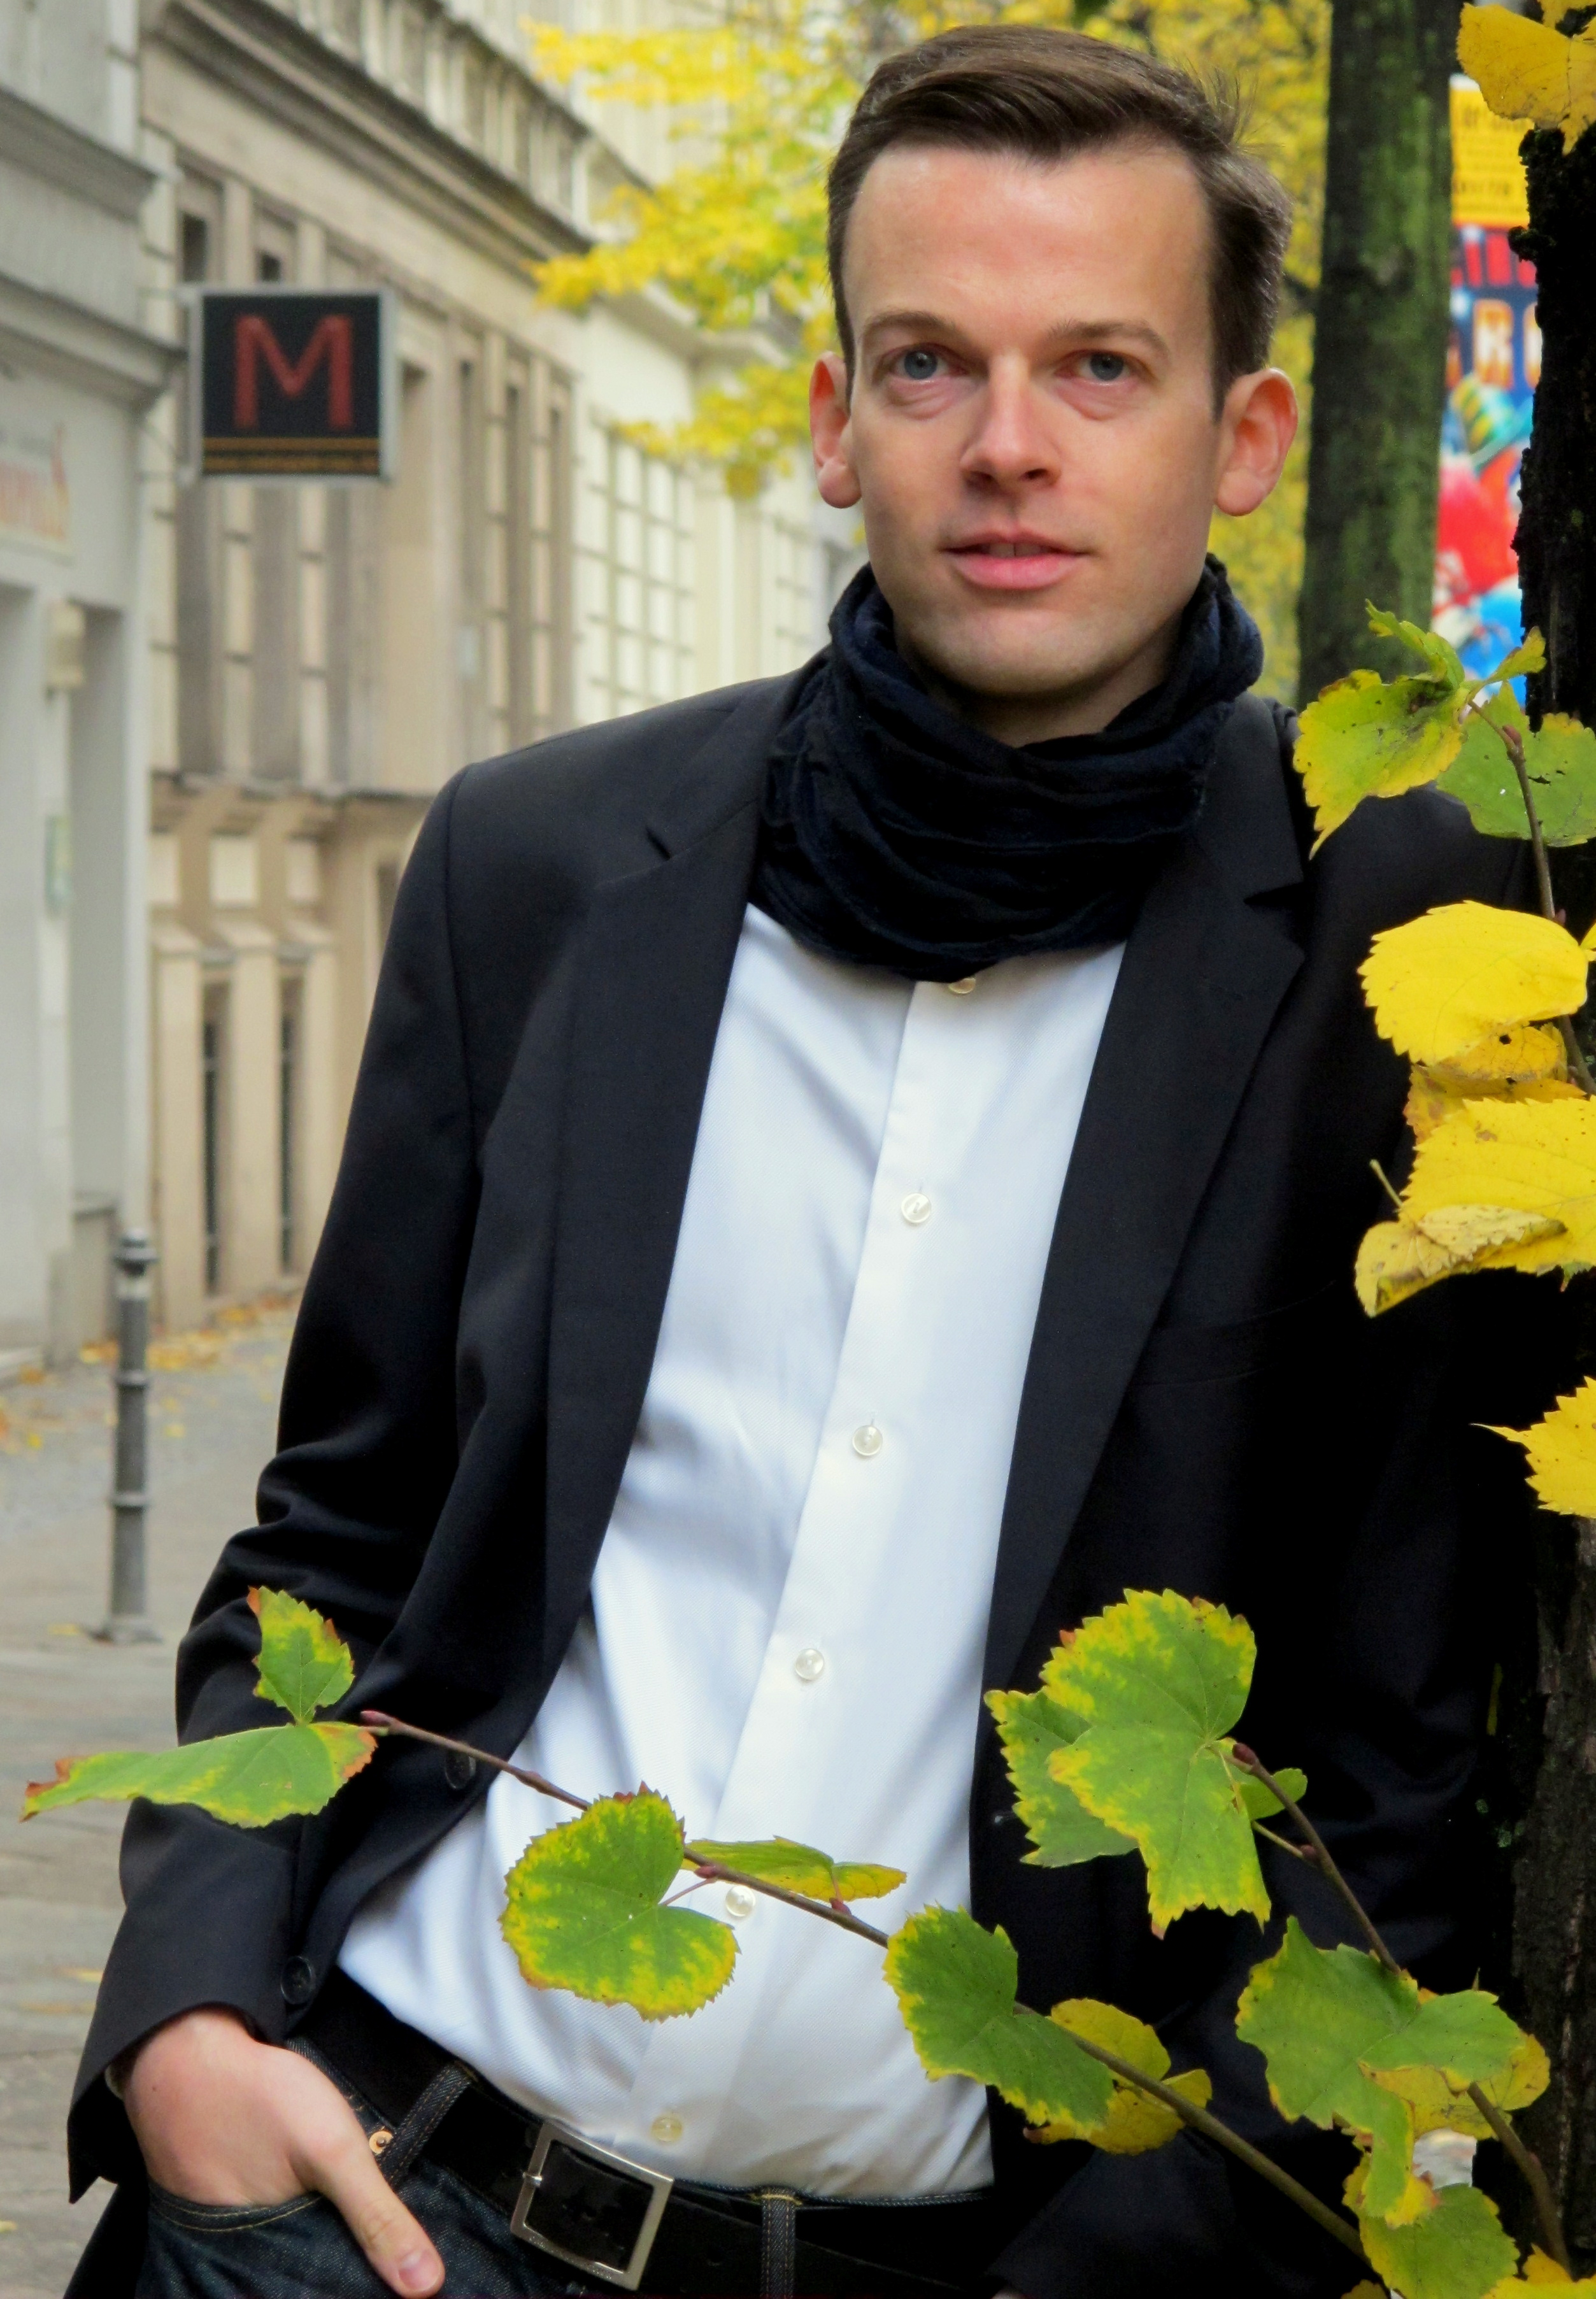 Christoph Ostendorf